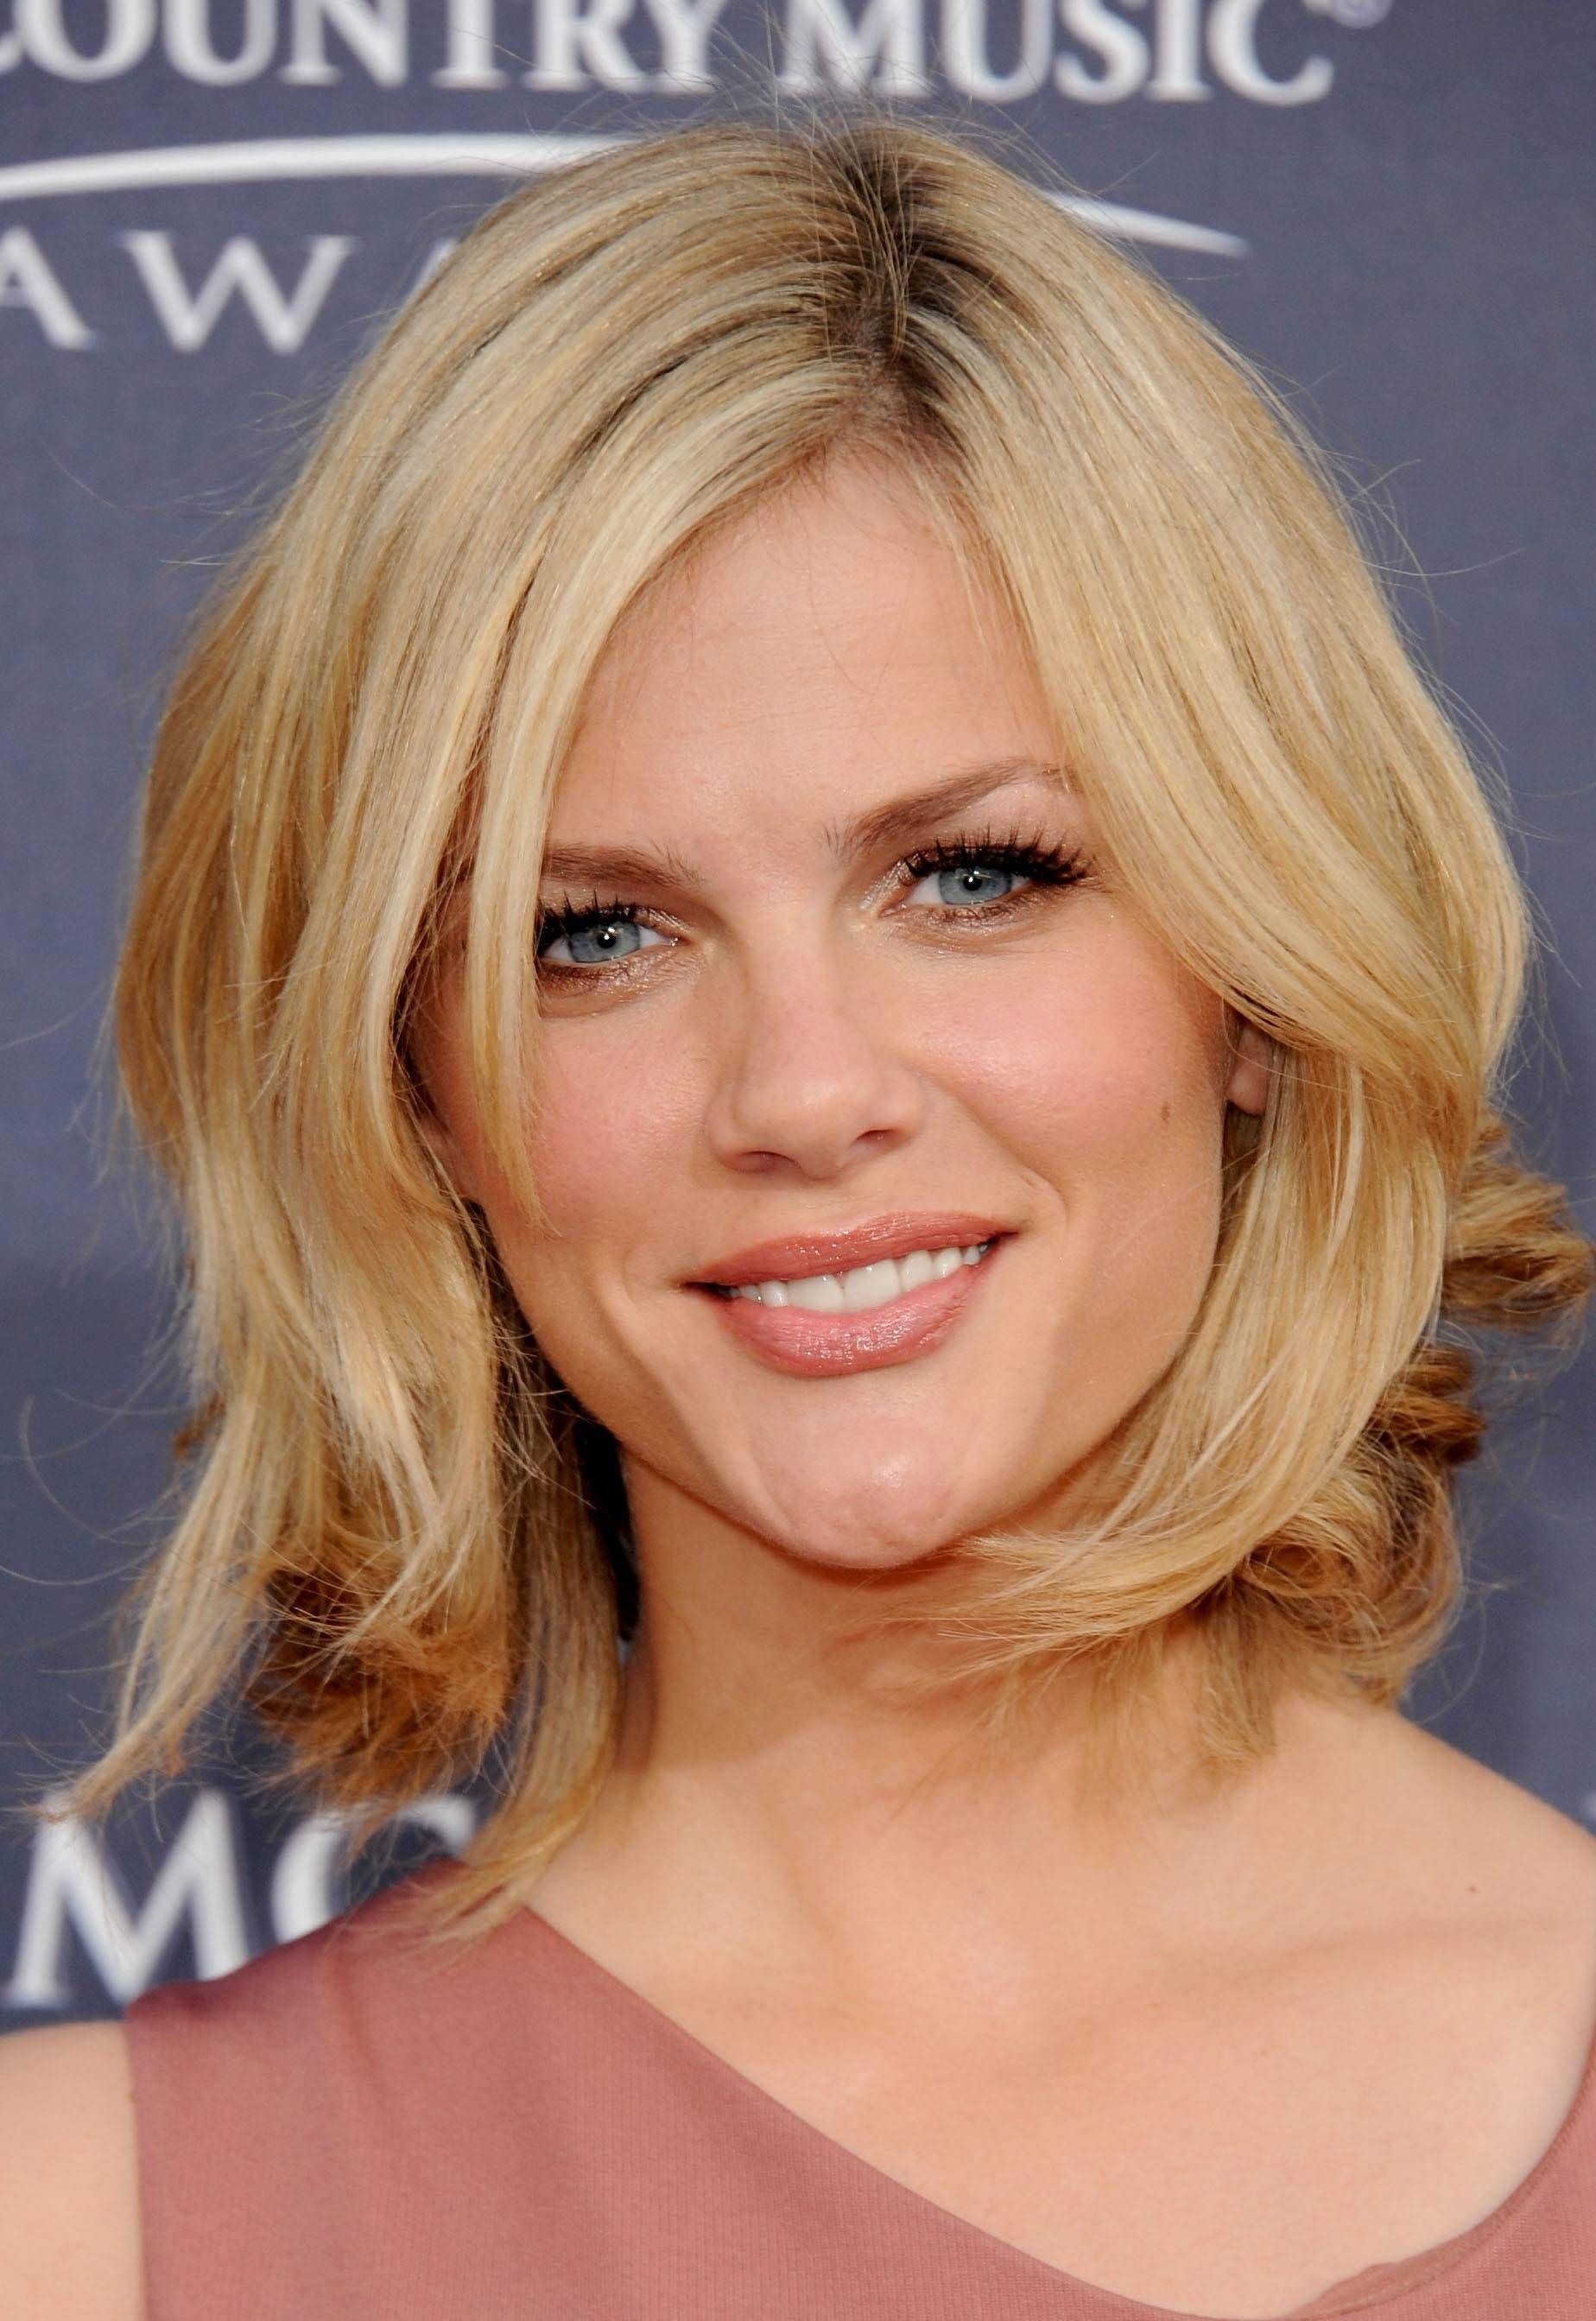 Stupendous 1000 Images About Medium Length Haircuts On Pinterest Medium Short Hairstyles Gunalazisus